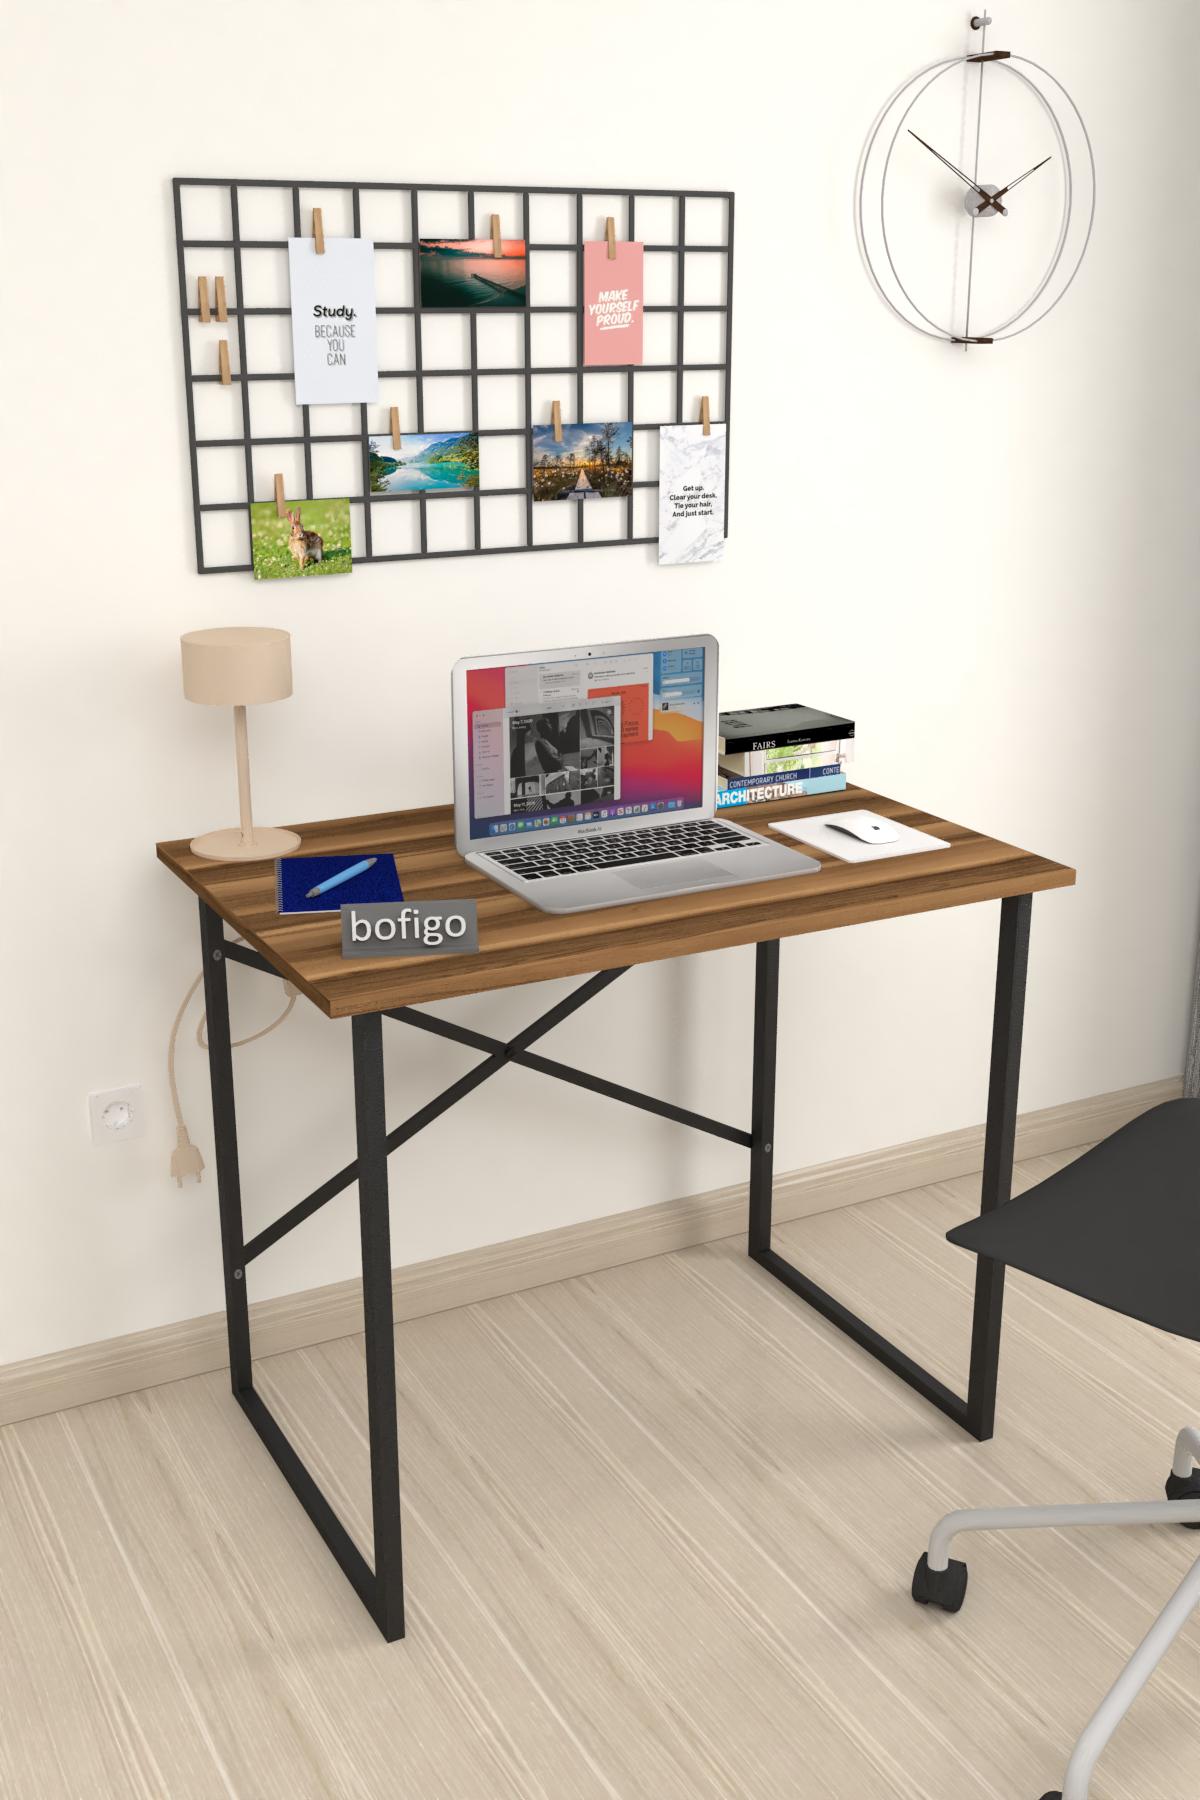 Bofigo Çalışma Masası 60x90 cm Ceviz